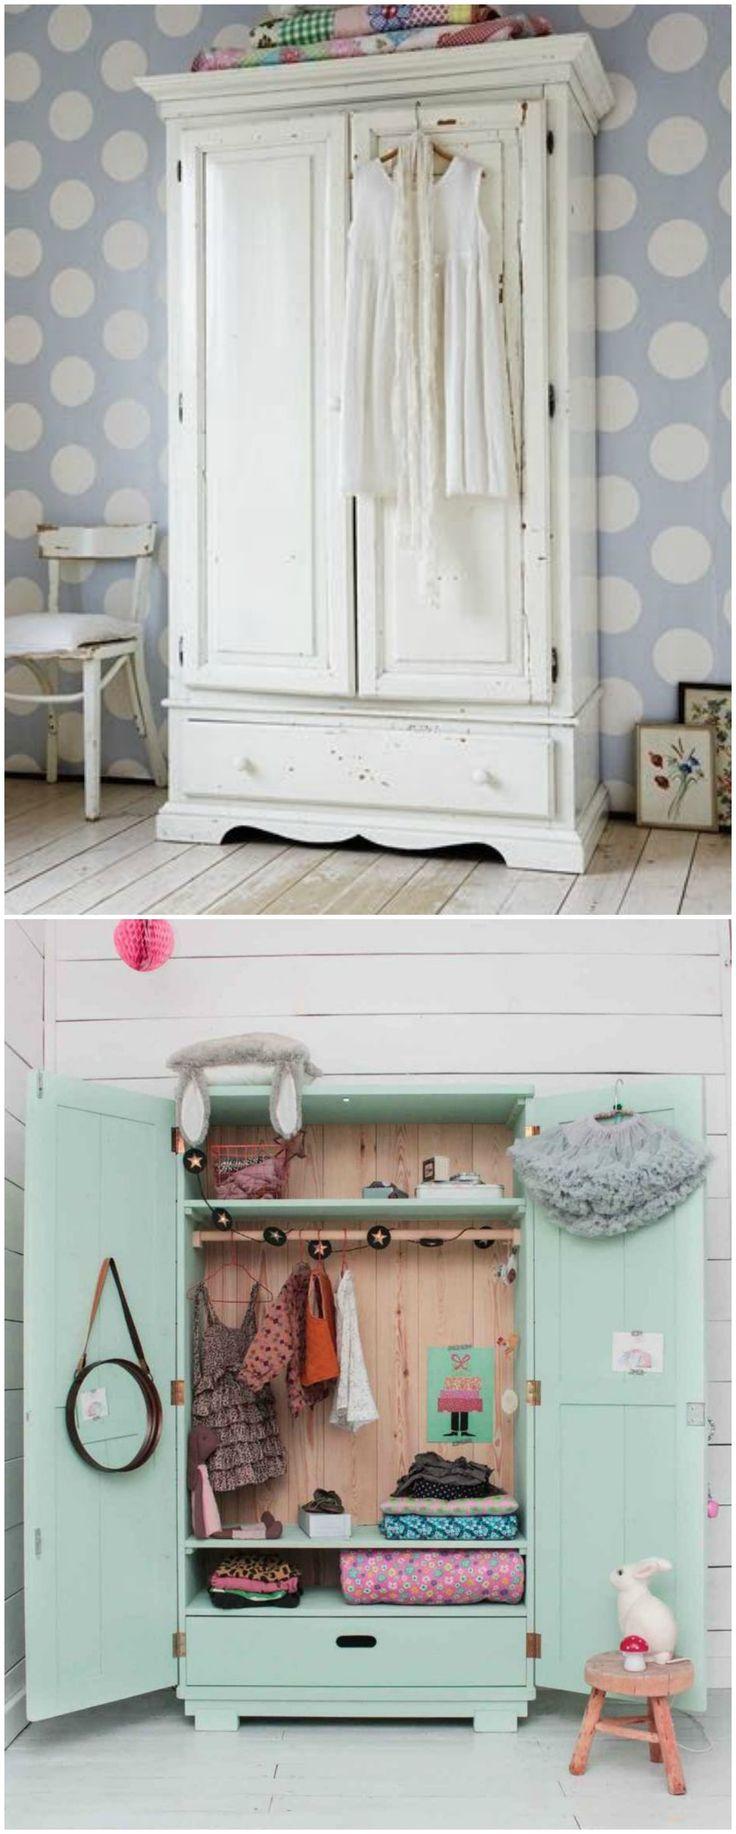 M s de 25 ideas fant sticas sobre muebles antiguos en for Muebles restaurados vintage